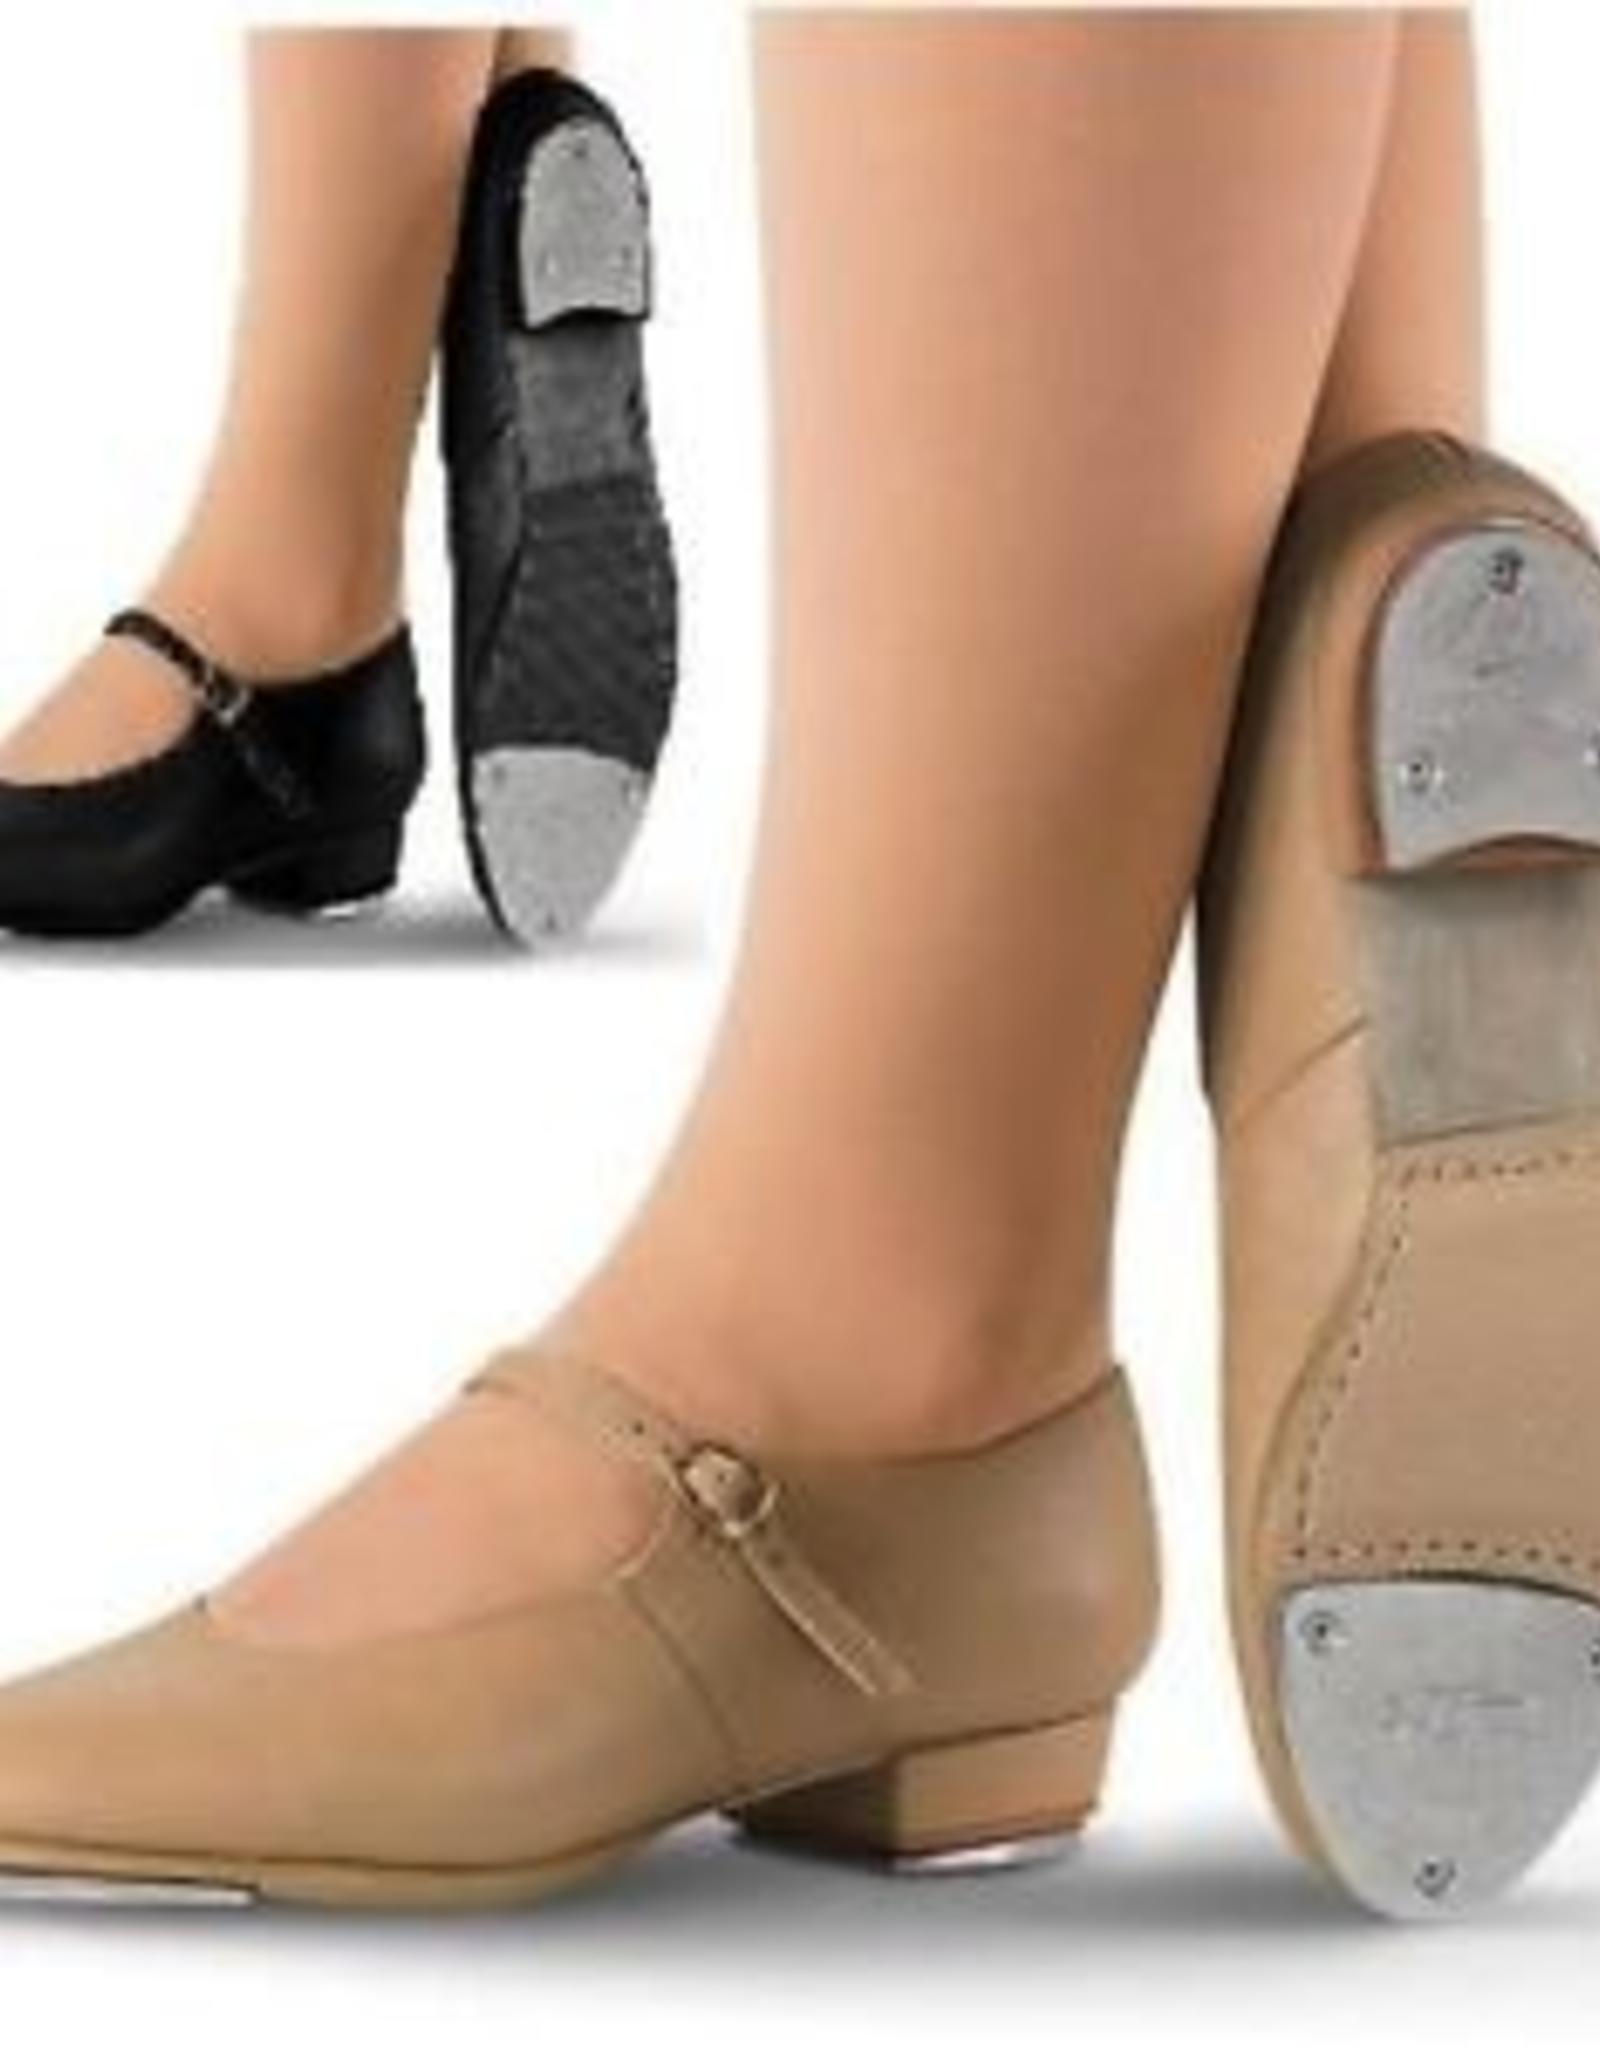 Leos LS3003L Ms. Giordano Tap Shoe Adult